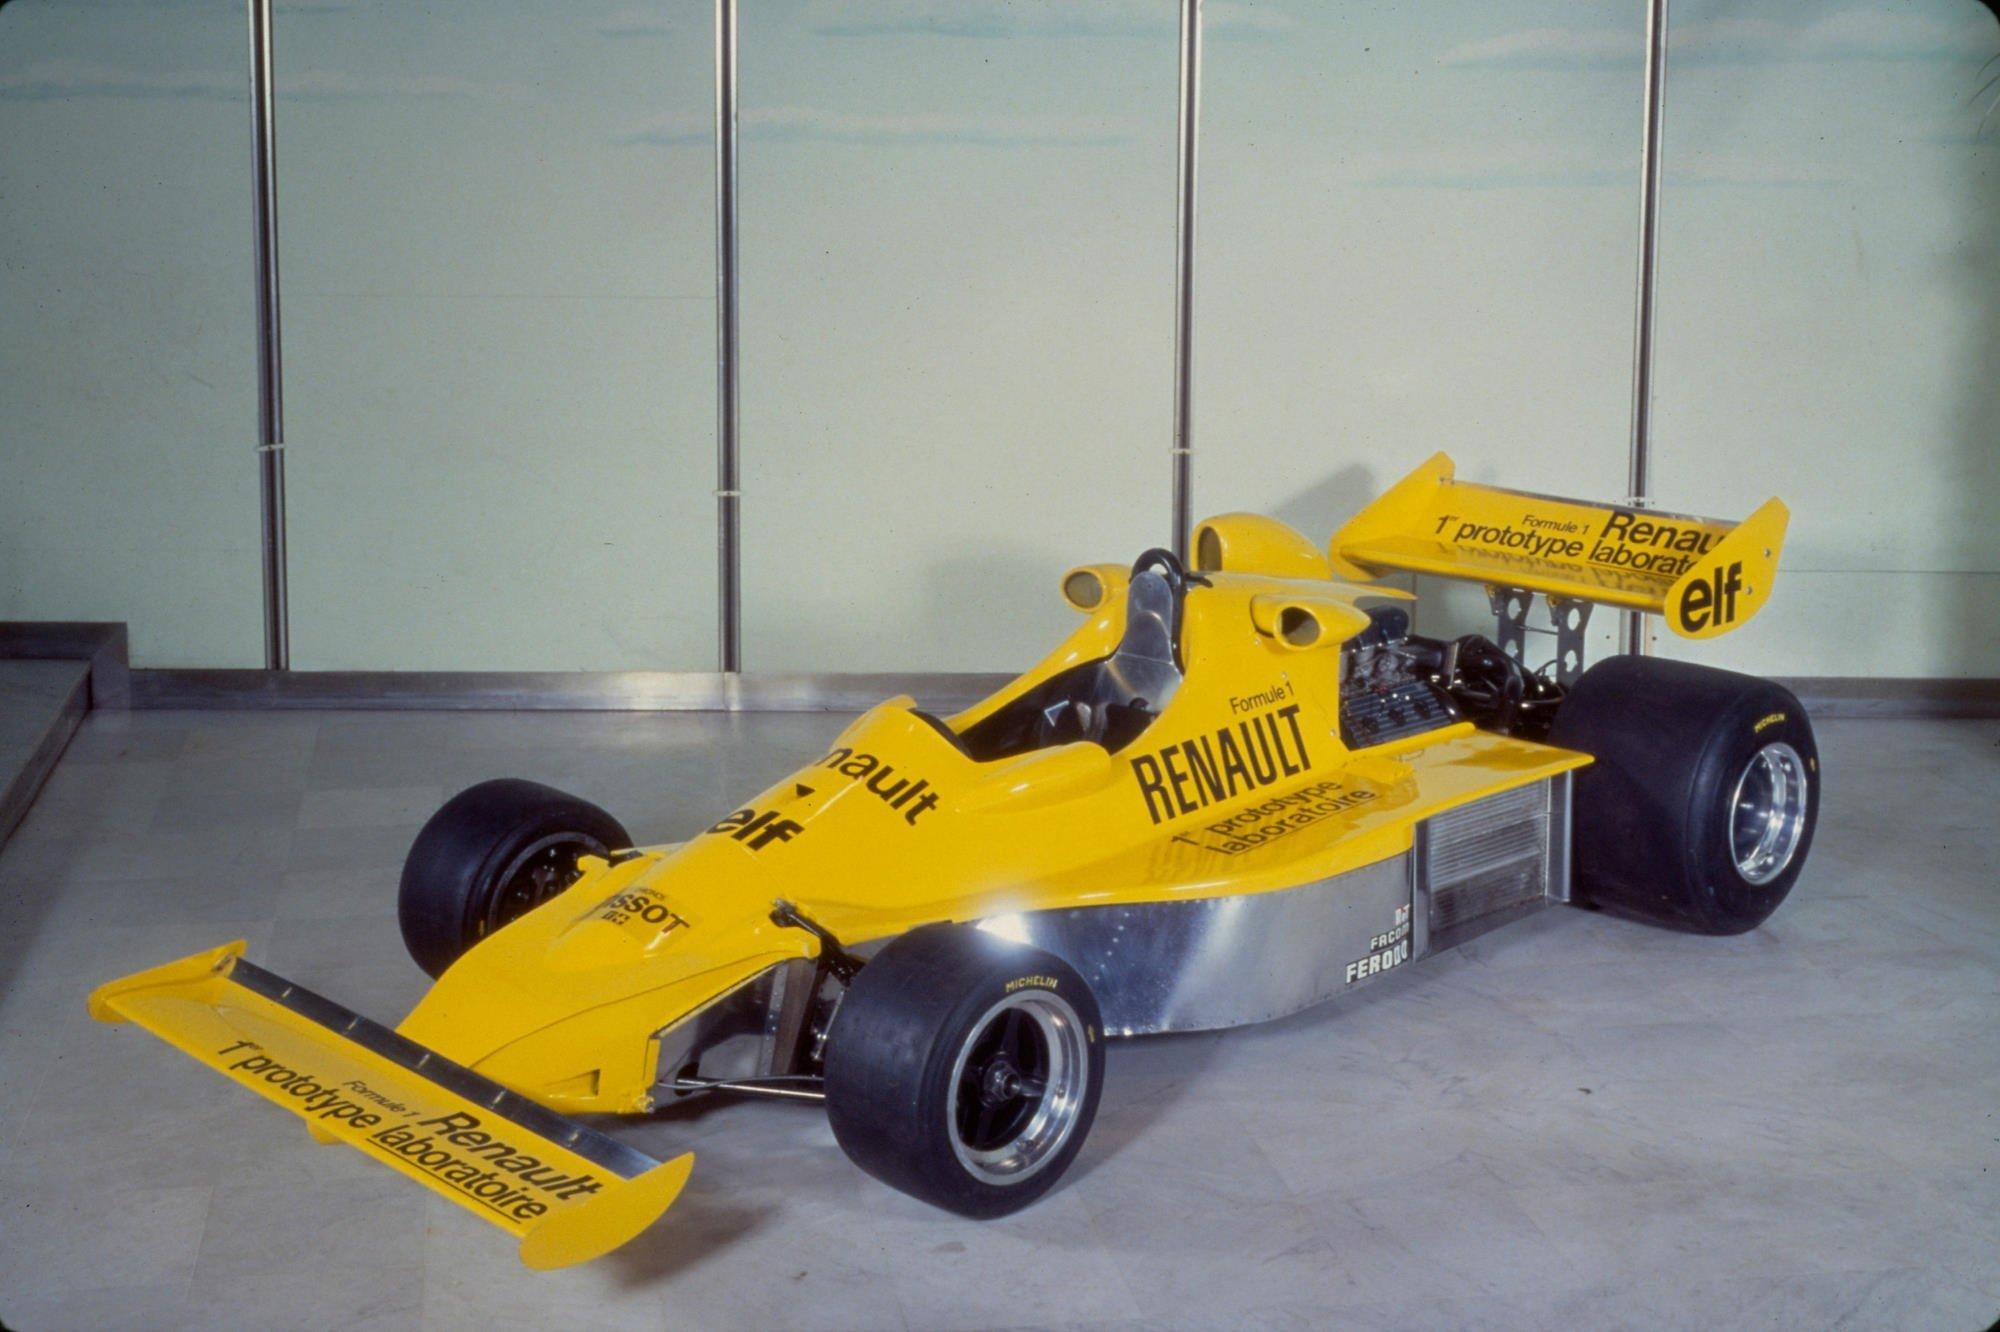 Alpine A500 F1 Team renault